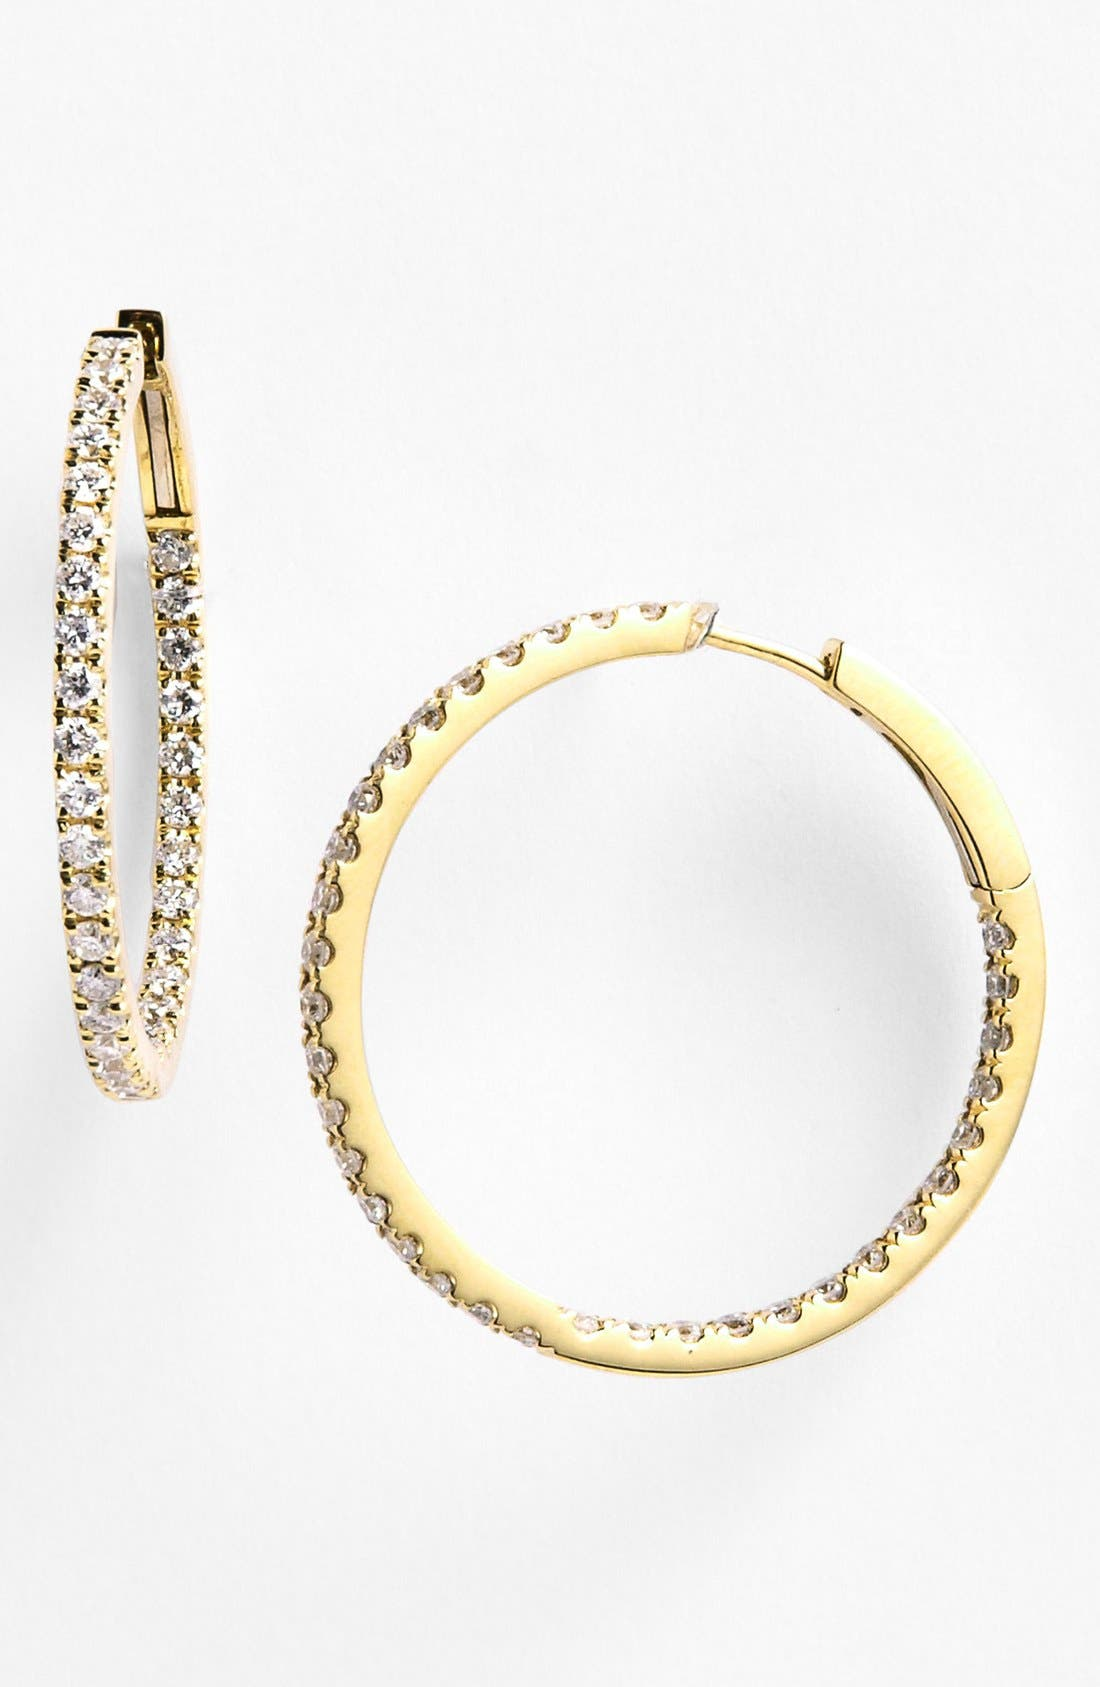 Alternate Image 1 Selected - Bony Levy Inside Out Diamond Hoop Earrings (Nordstrom Exclusive)